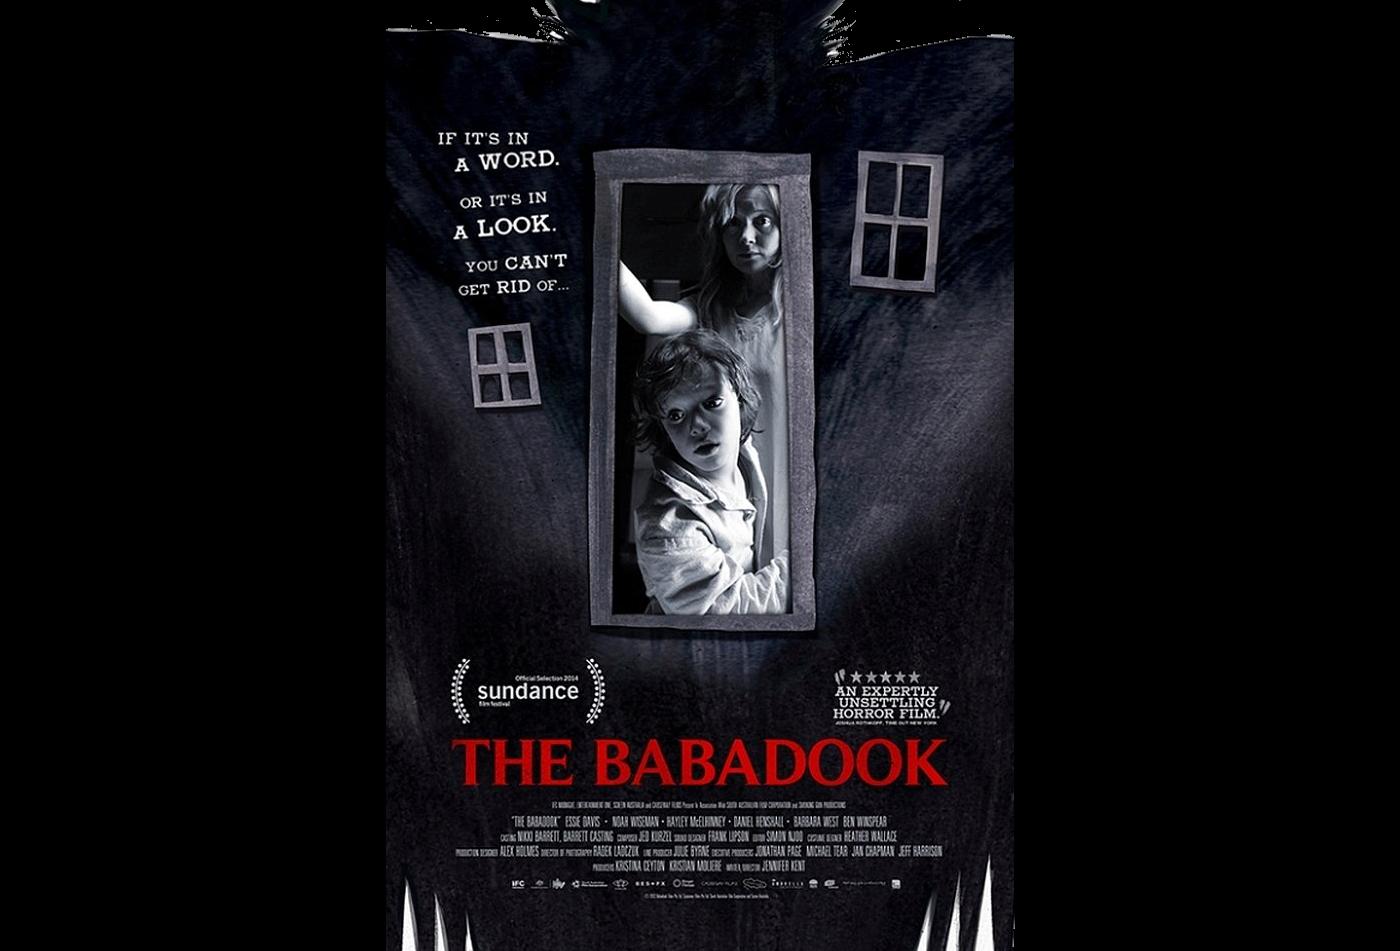 Halloween2018-3Babadook.png